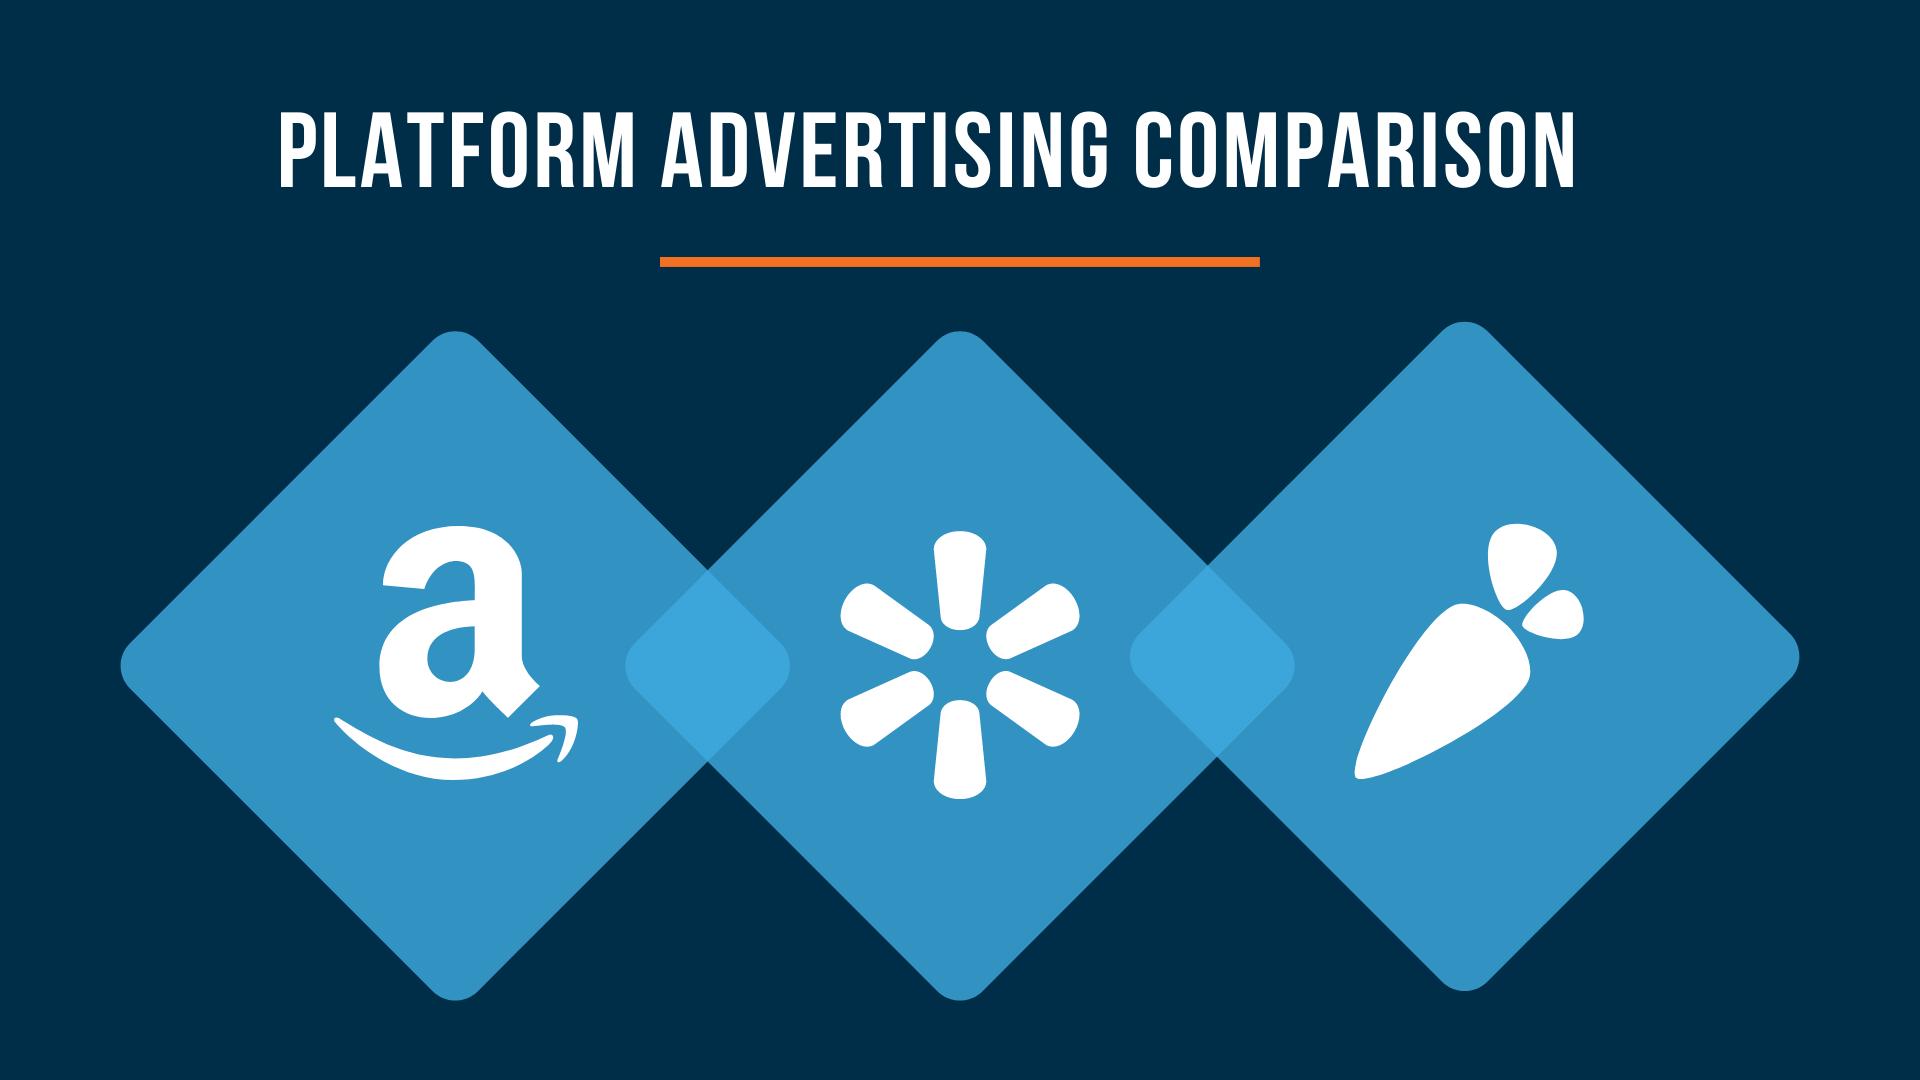 Amazon, Walmart & Instacart - Platform Advertising Comparison